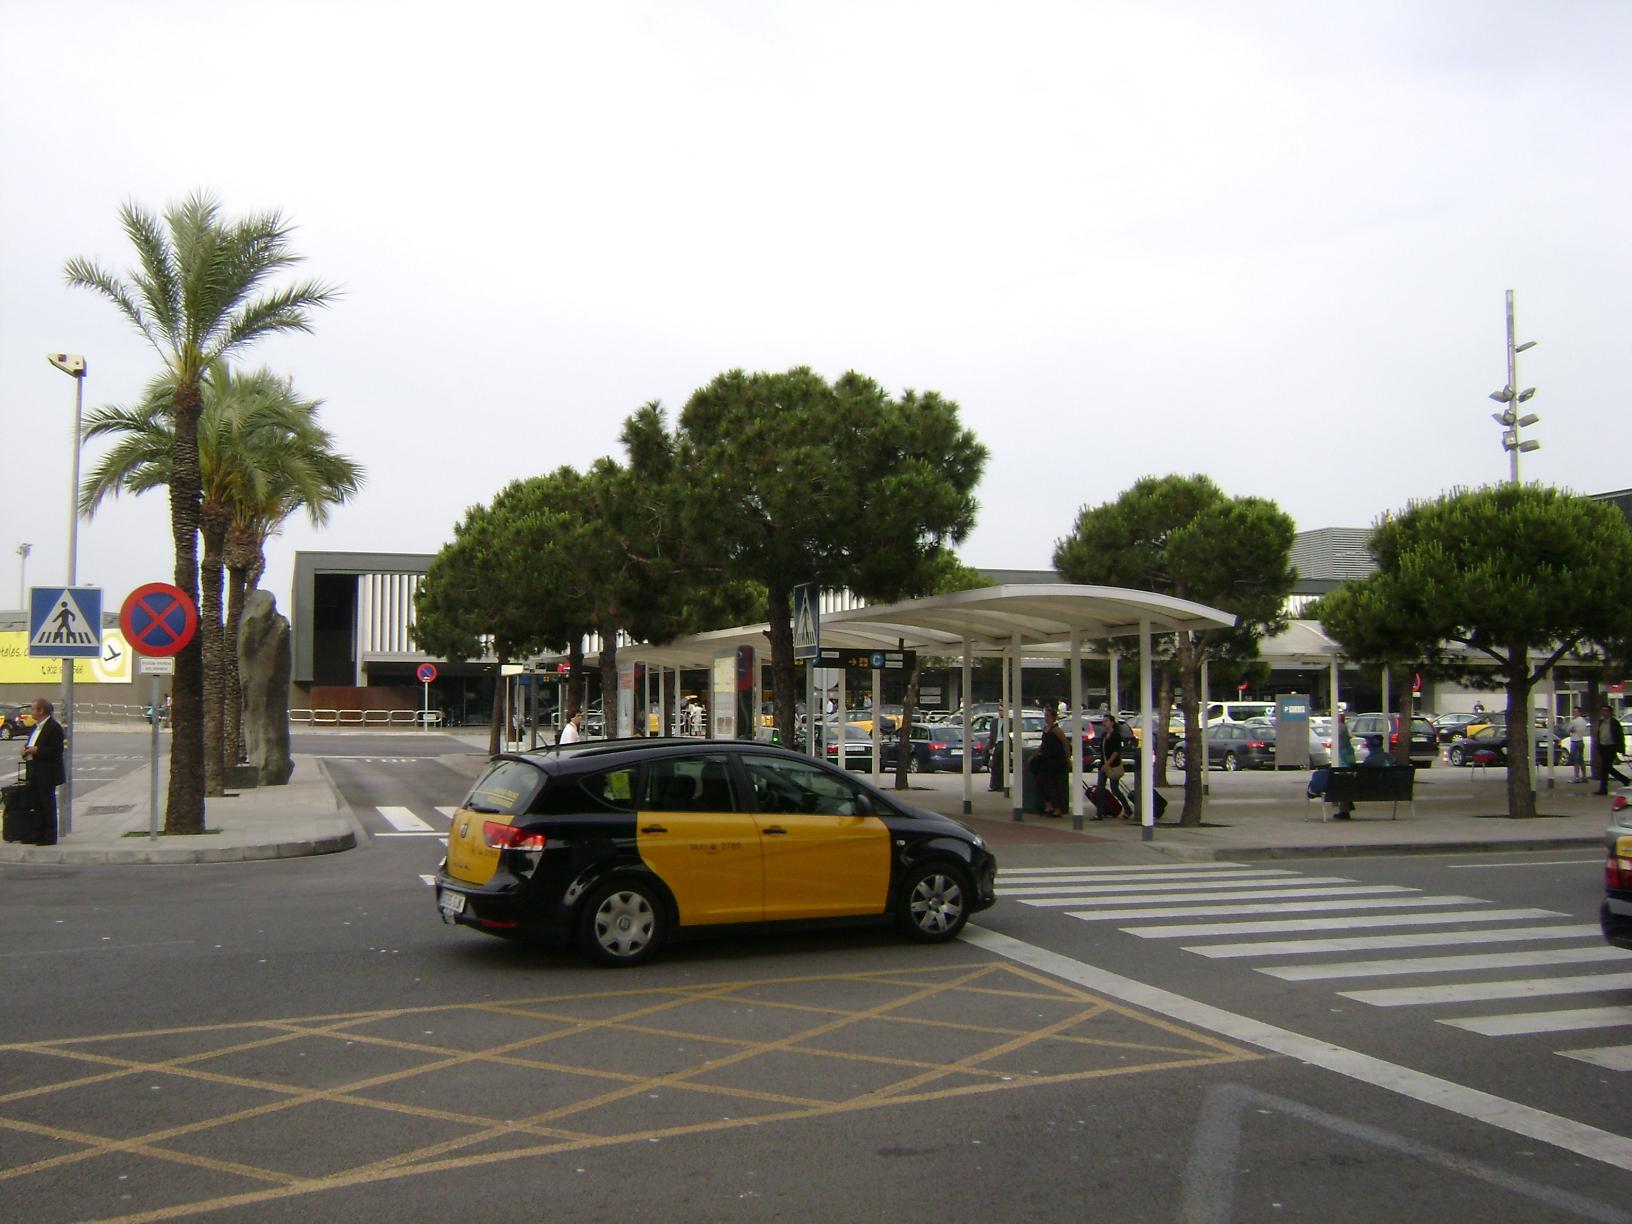 SEAT_Altea_XL_taxi